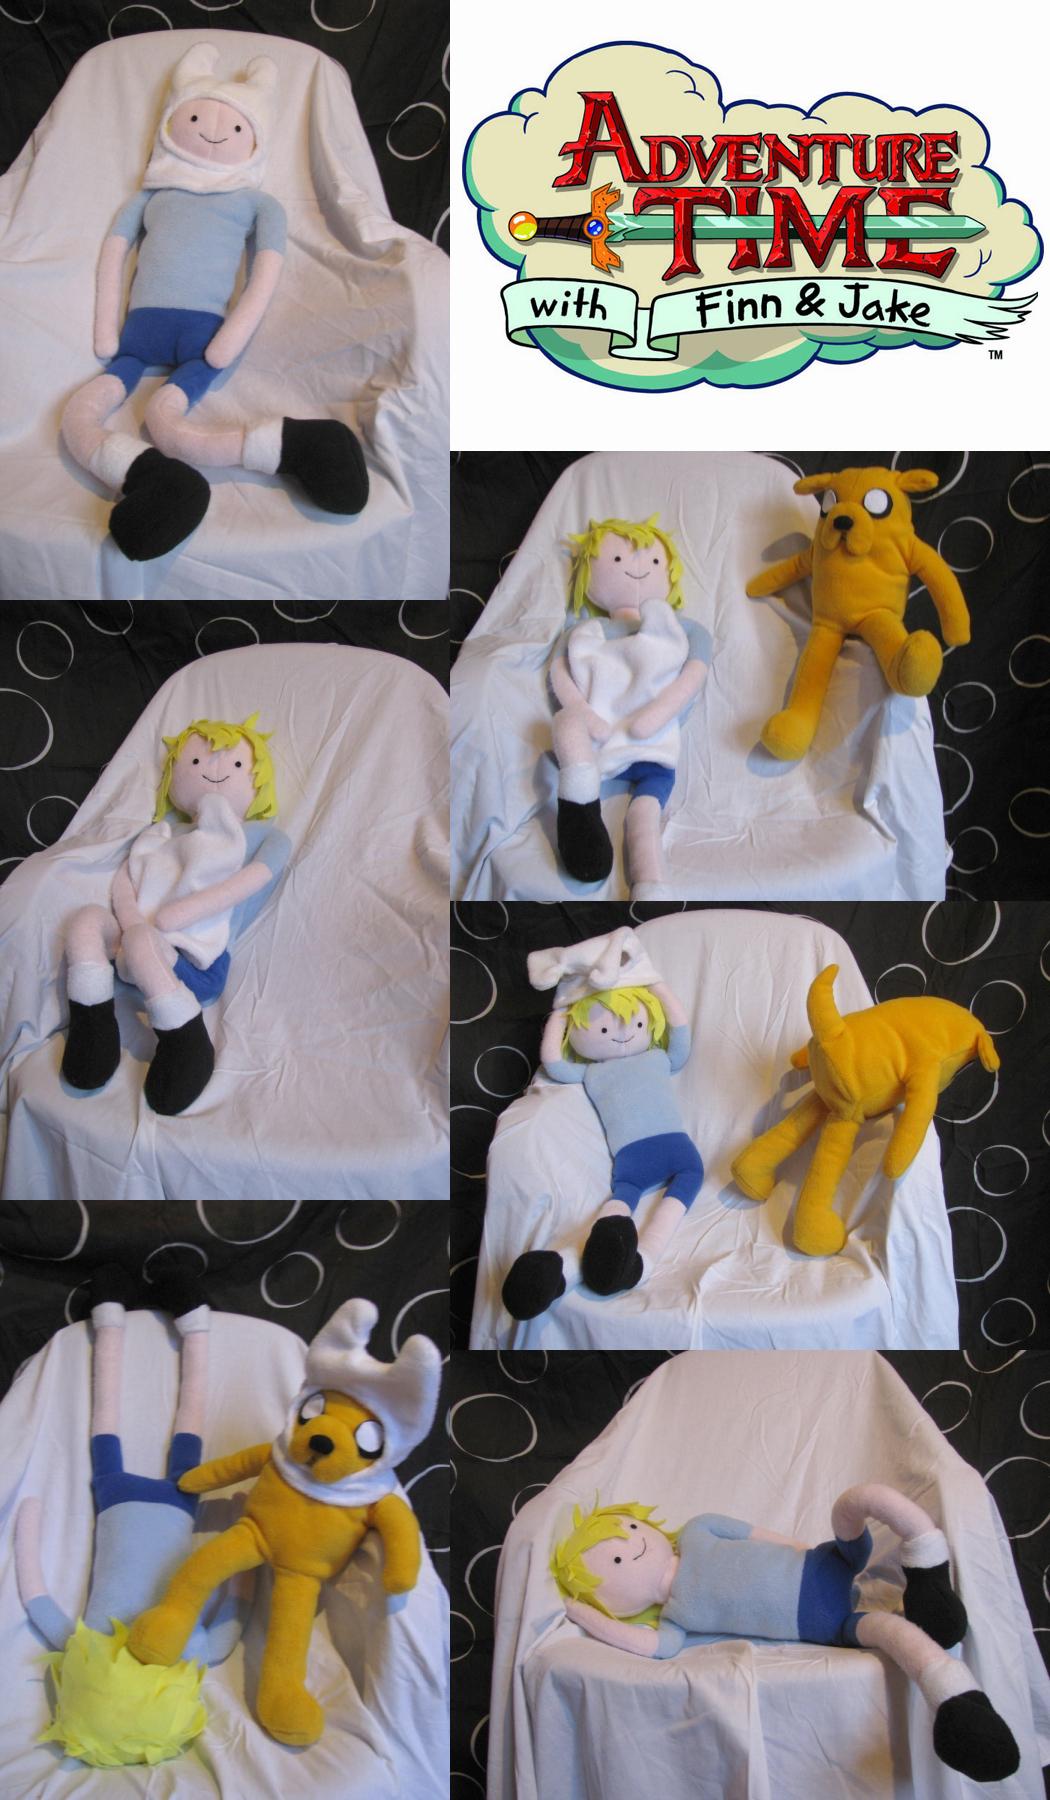 Adventure Time Plushies by chu-po-po